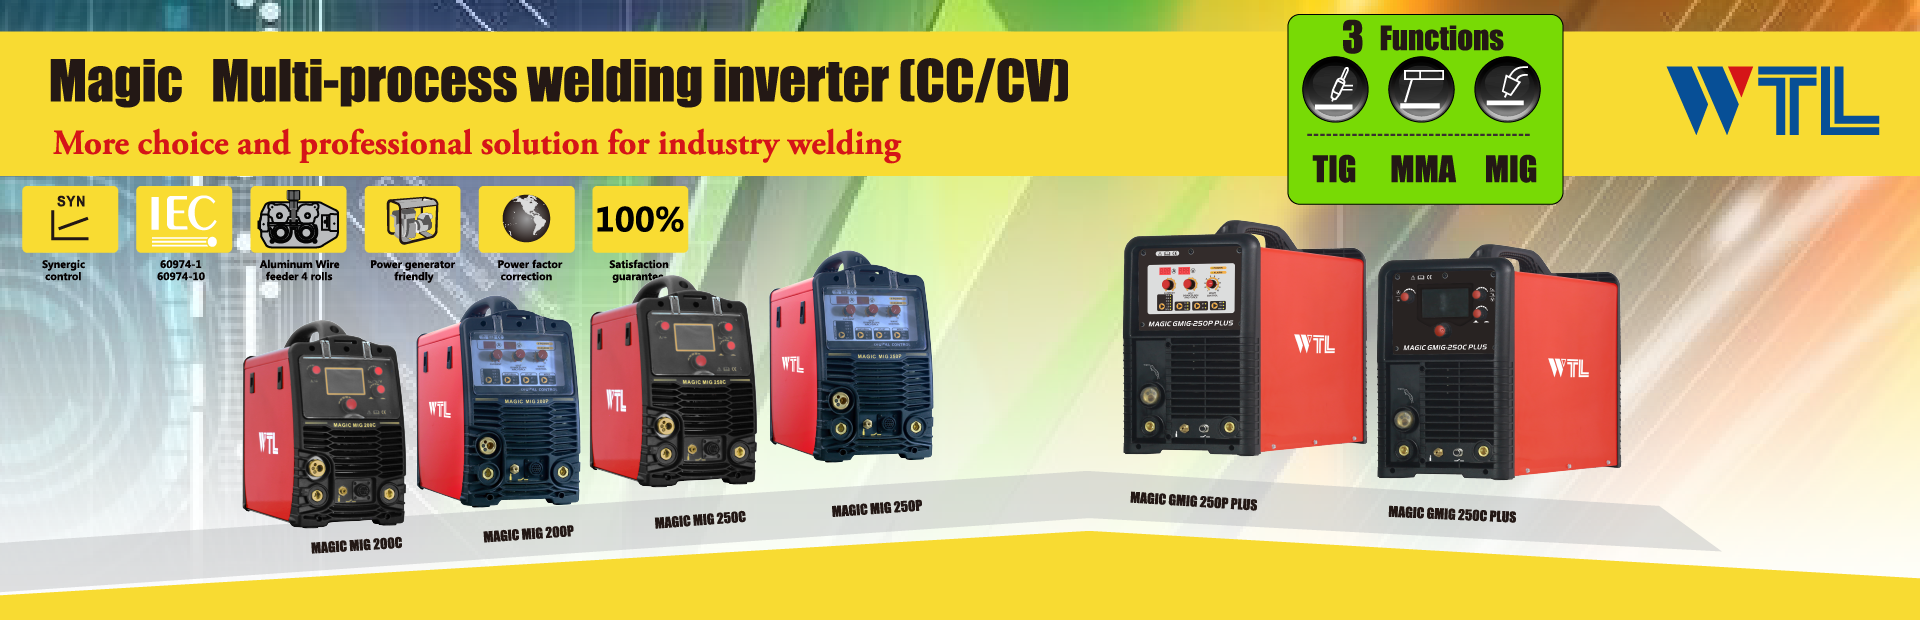 Welding Inverter Circuit Diagram About Us